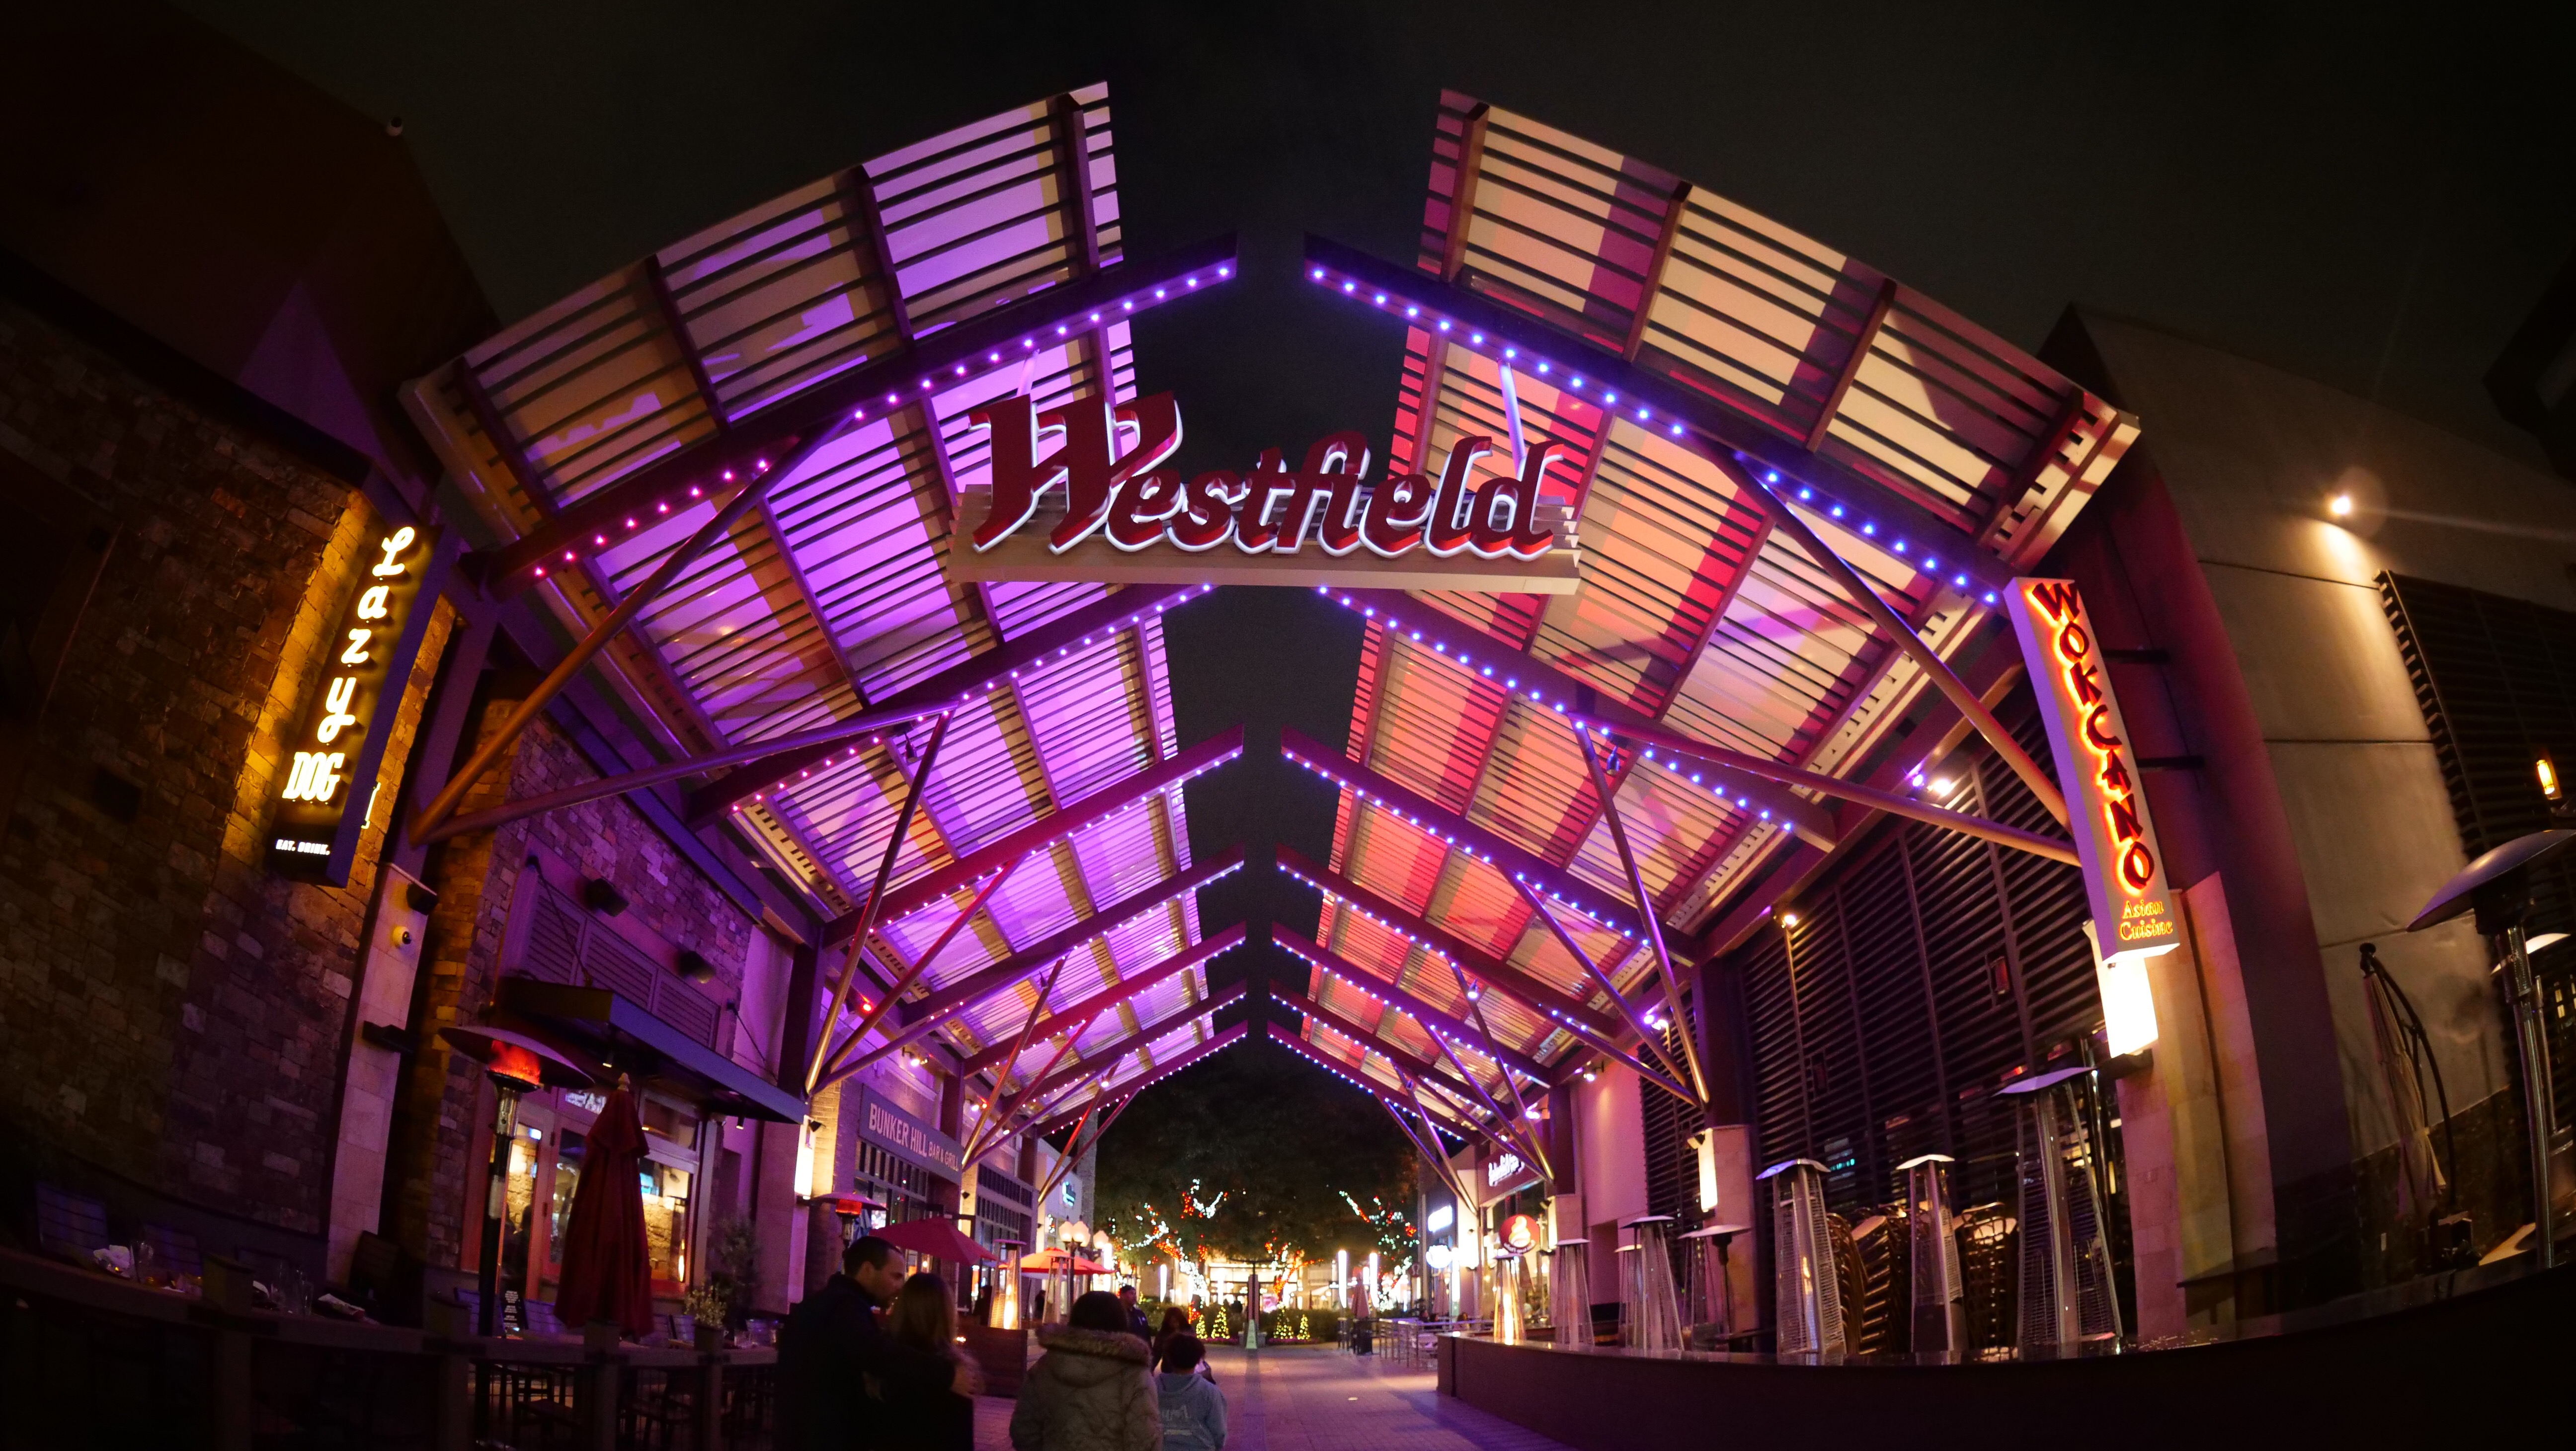 Westfield Valencia Architectural Lighting